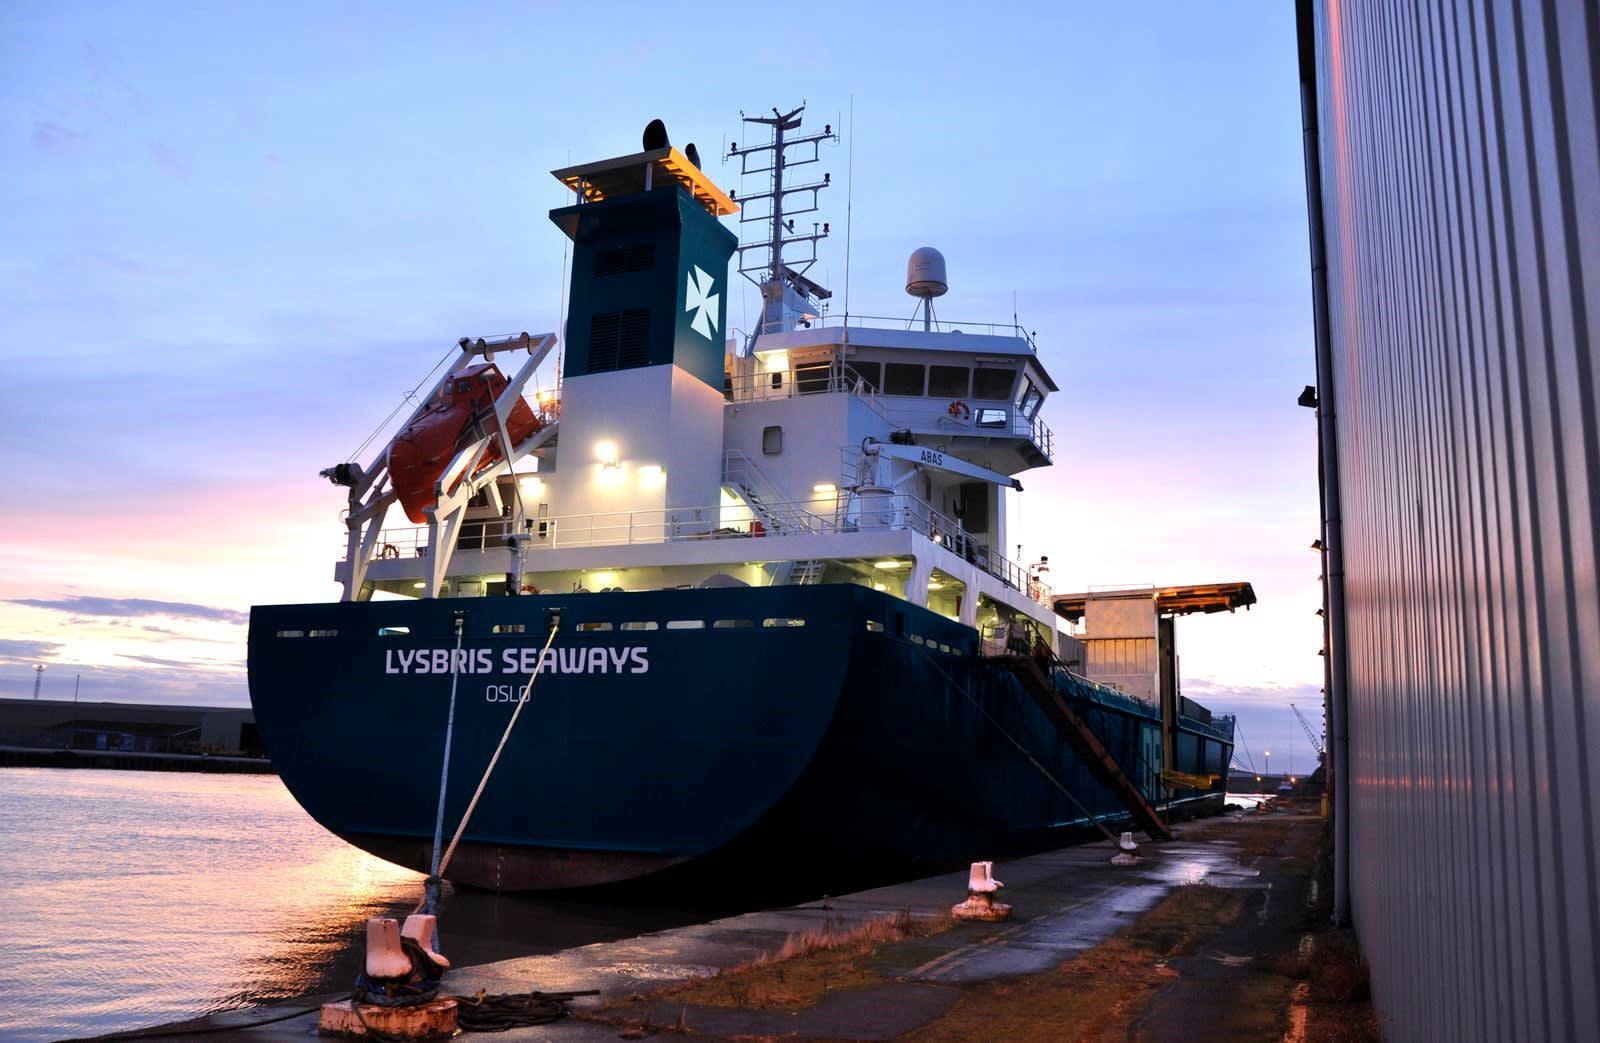 Lysbris Seaways smaller